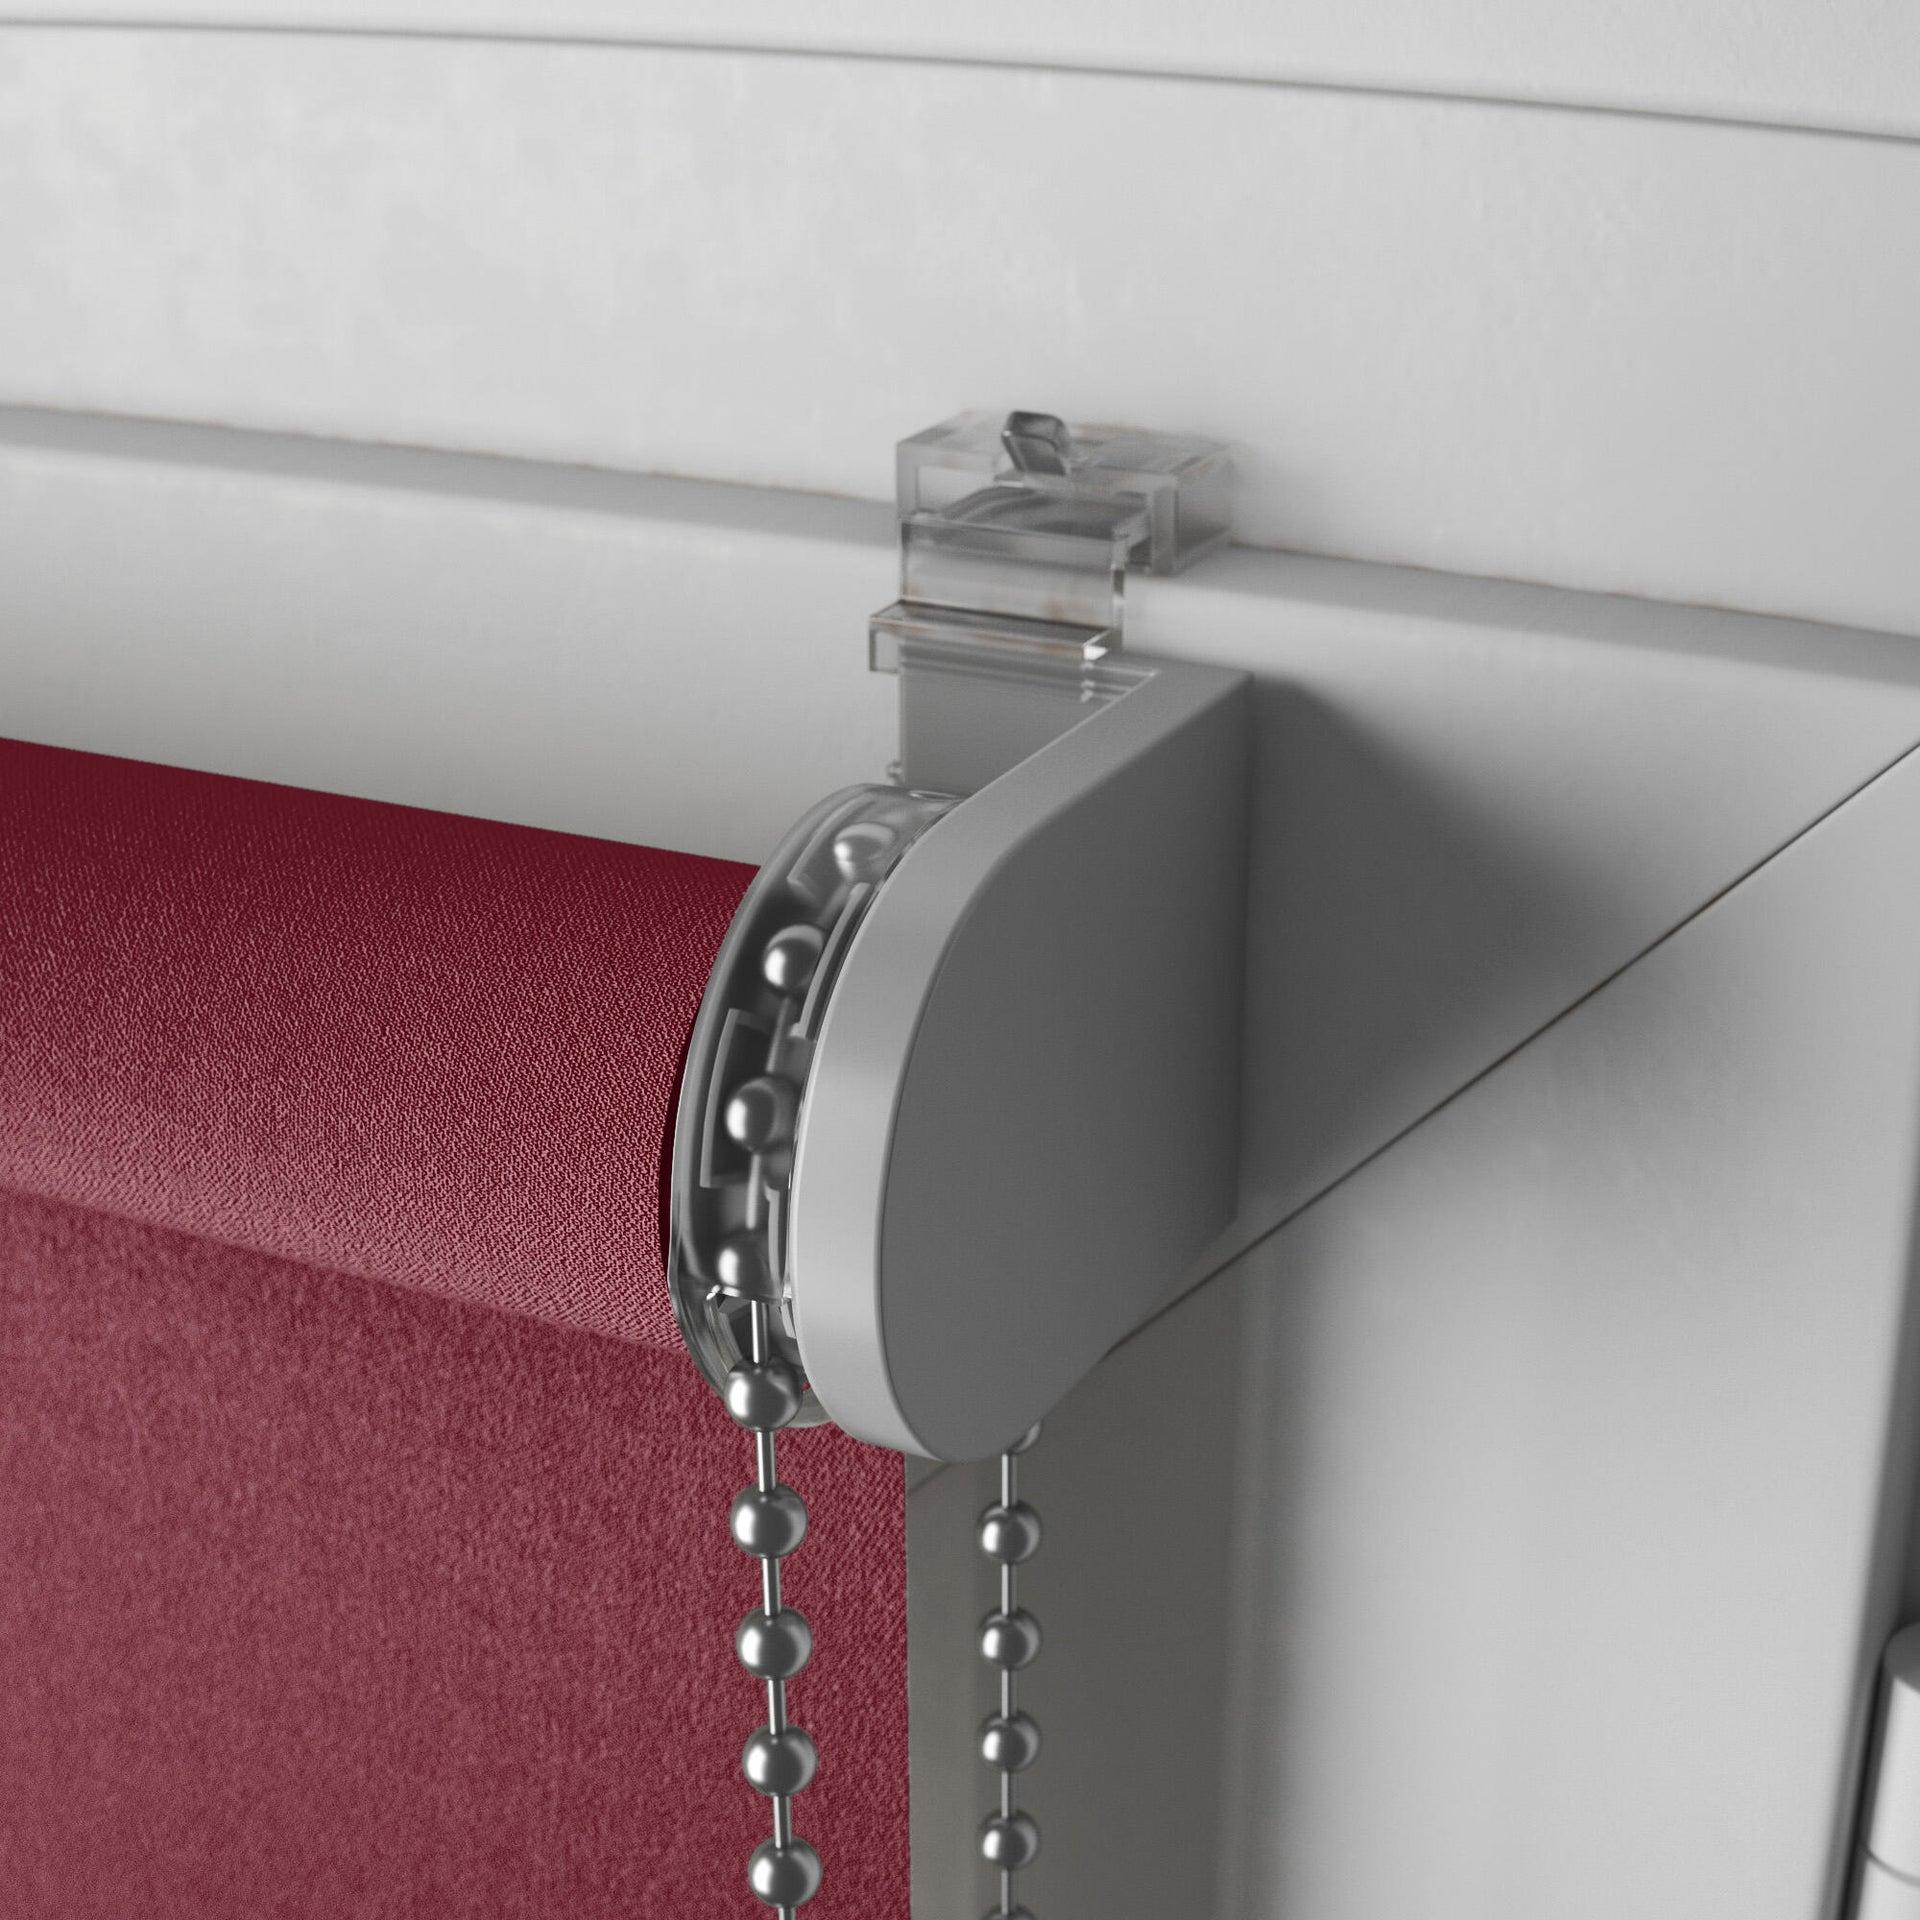 Tenda a rullo oscurante INSPIRE Tokyo rosso 140 x 160 cm - 6